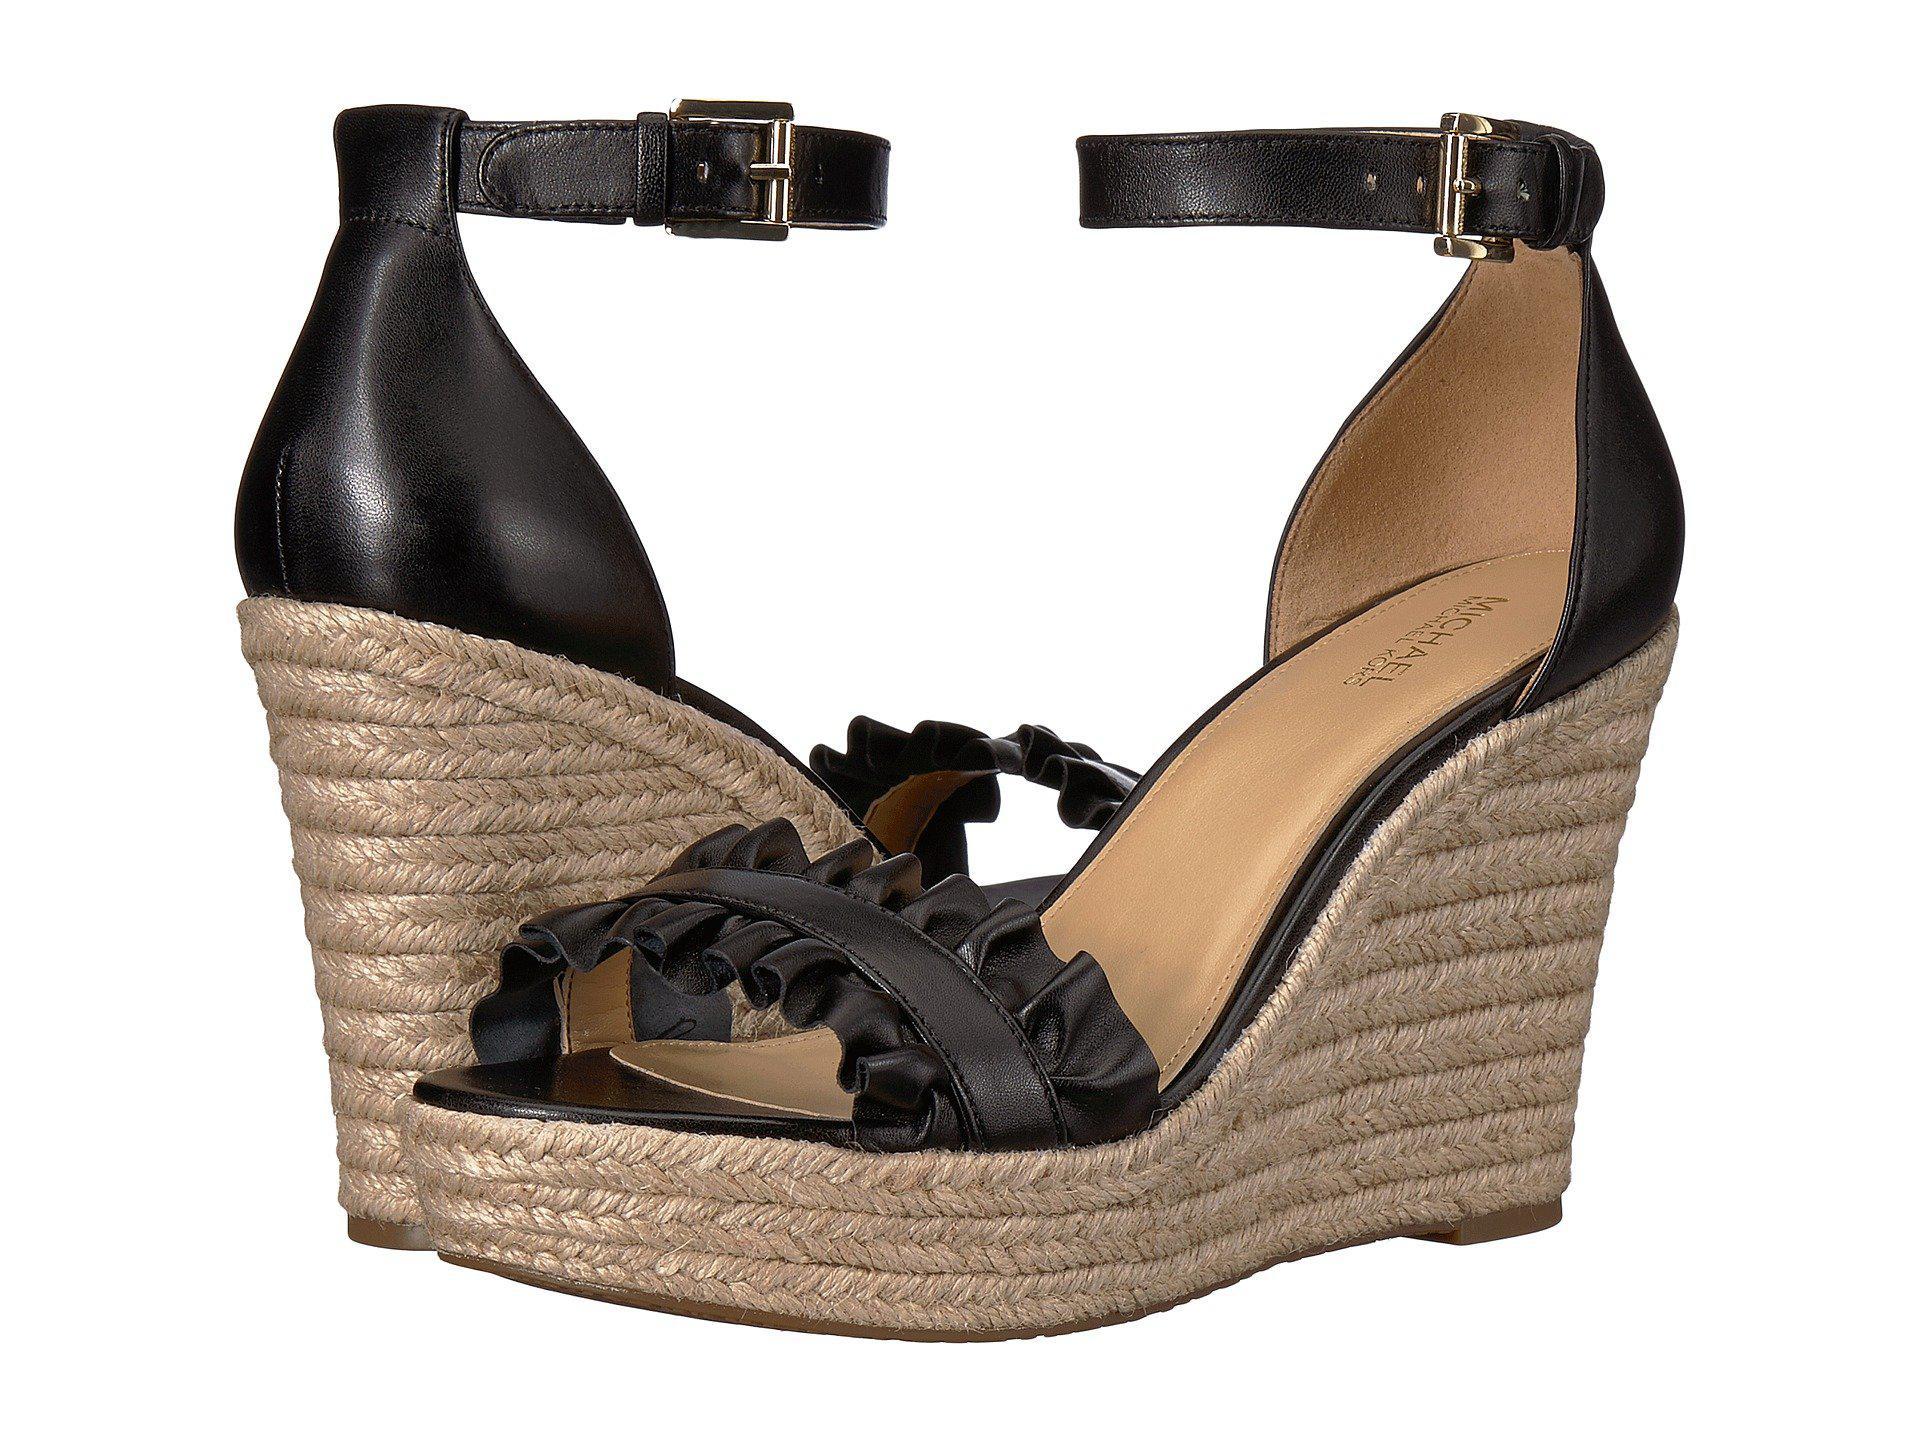 f5b0c8453e47 Lyst - MICHAEL Michael Kors Bella Wedge Sandal in Black